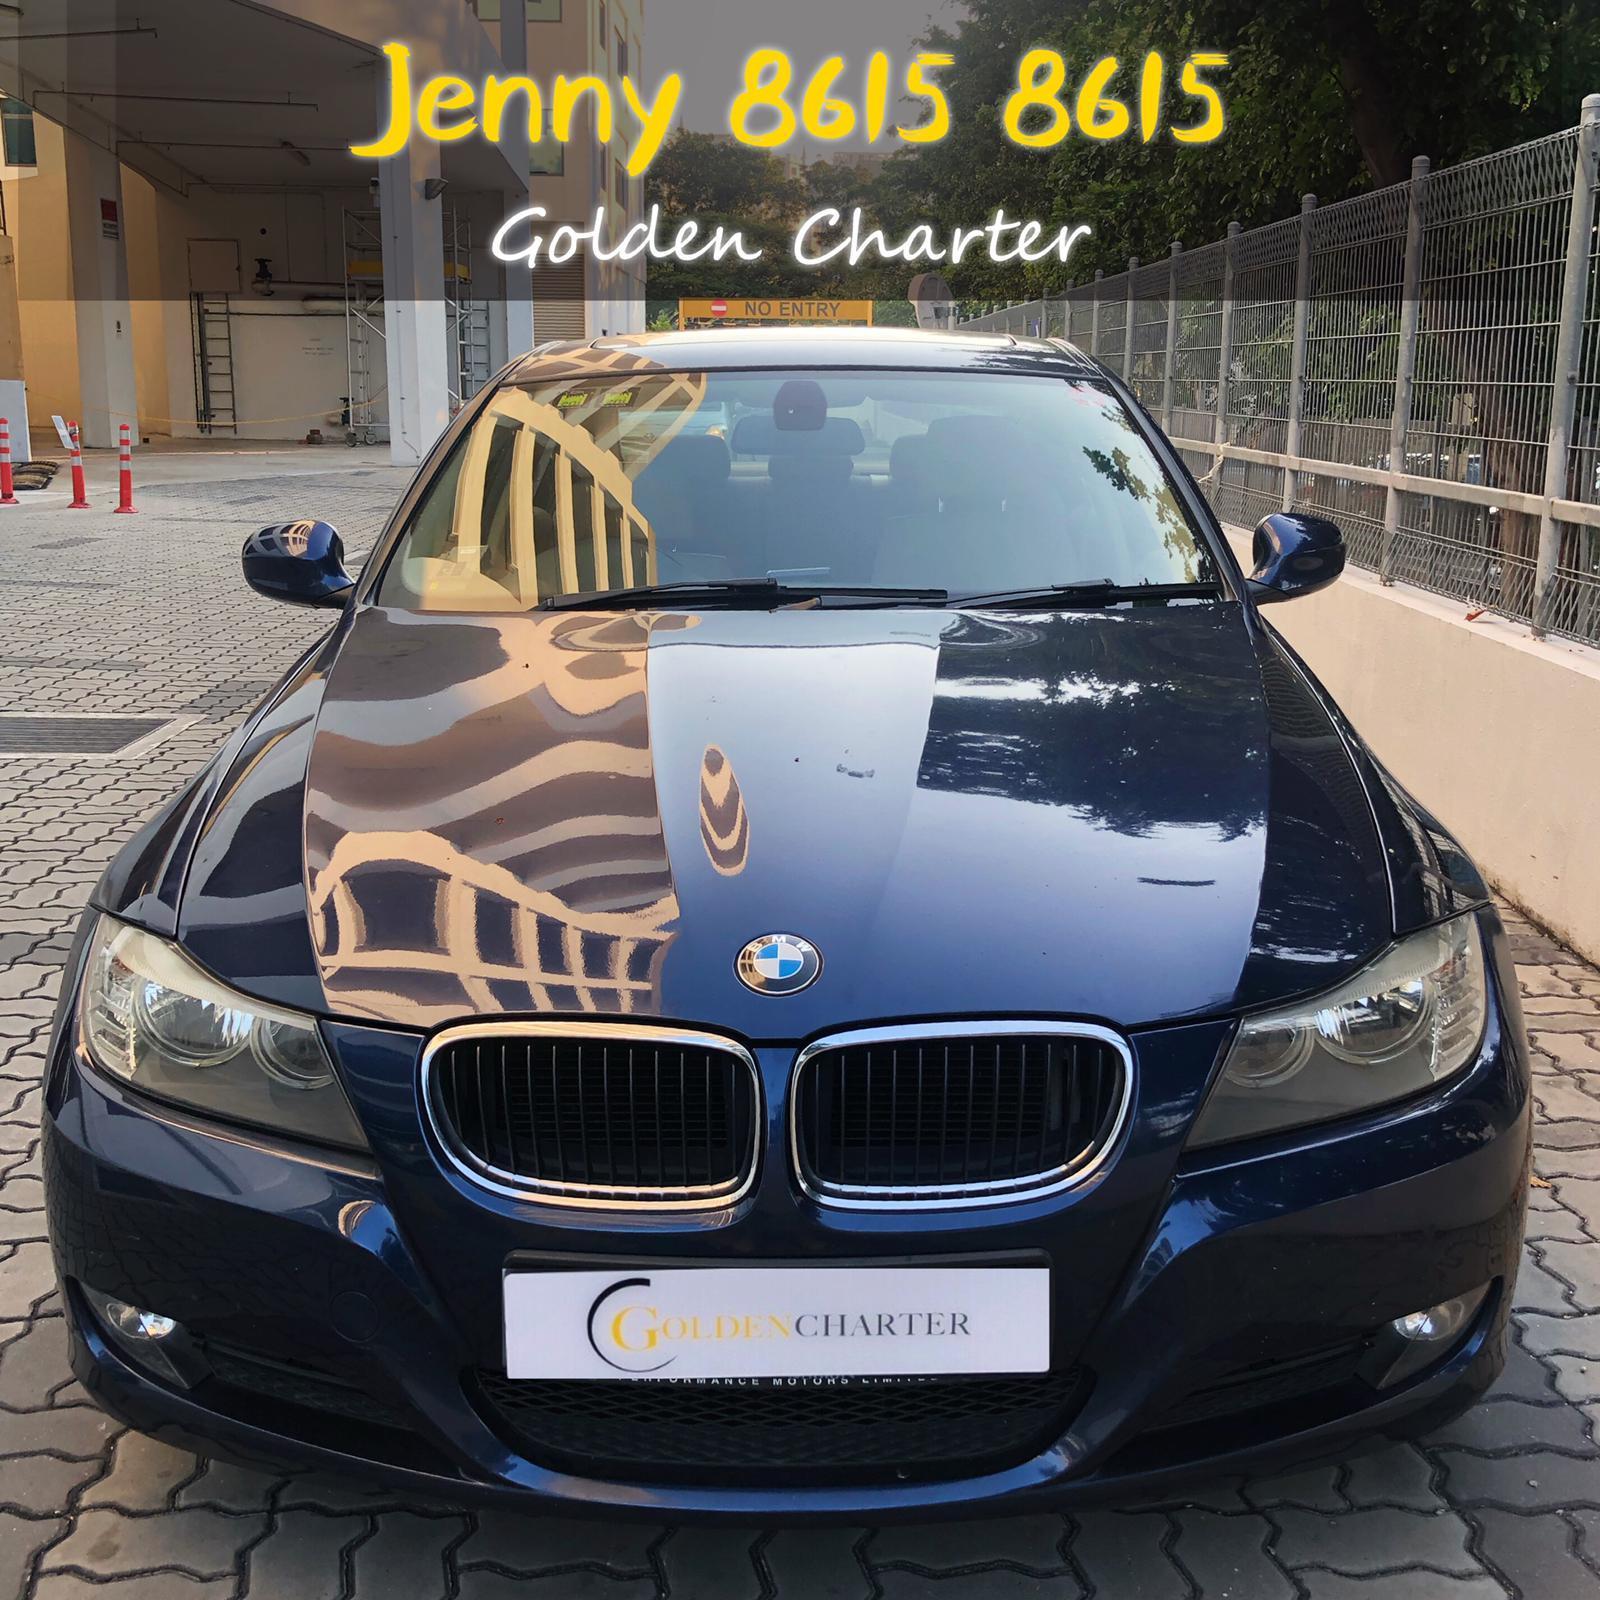 BMW 318i sunroof 2.0 long term rental $450 conti car.ggod condition n engine(before gojrk rebate)